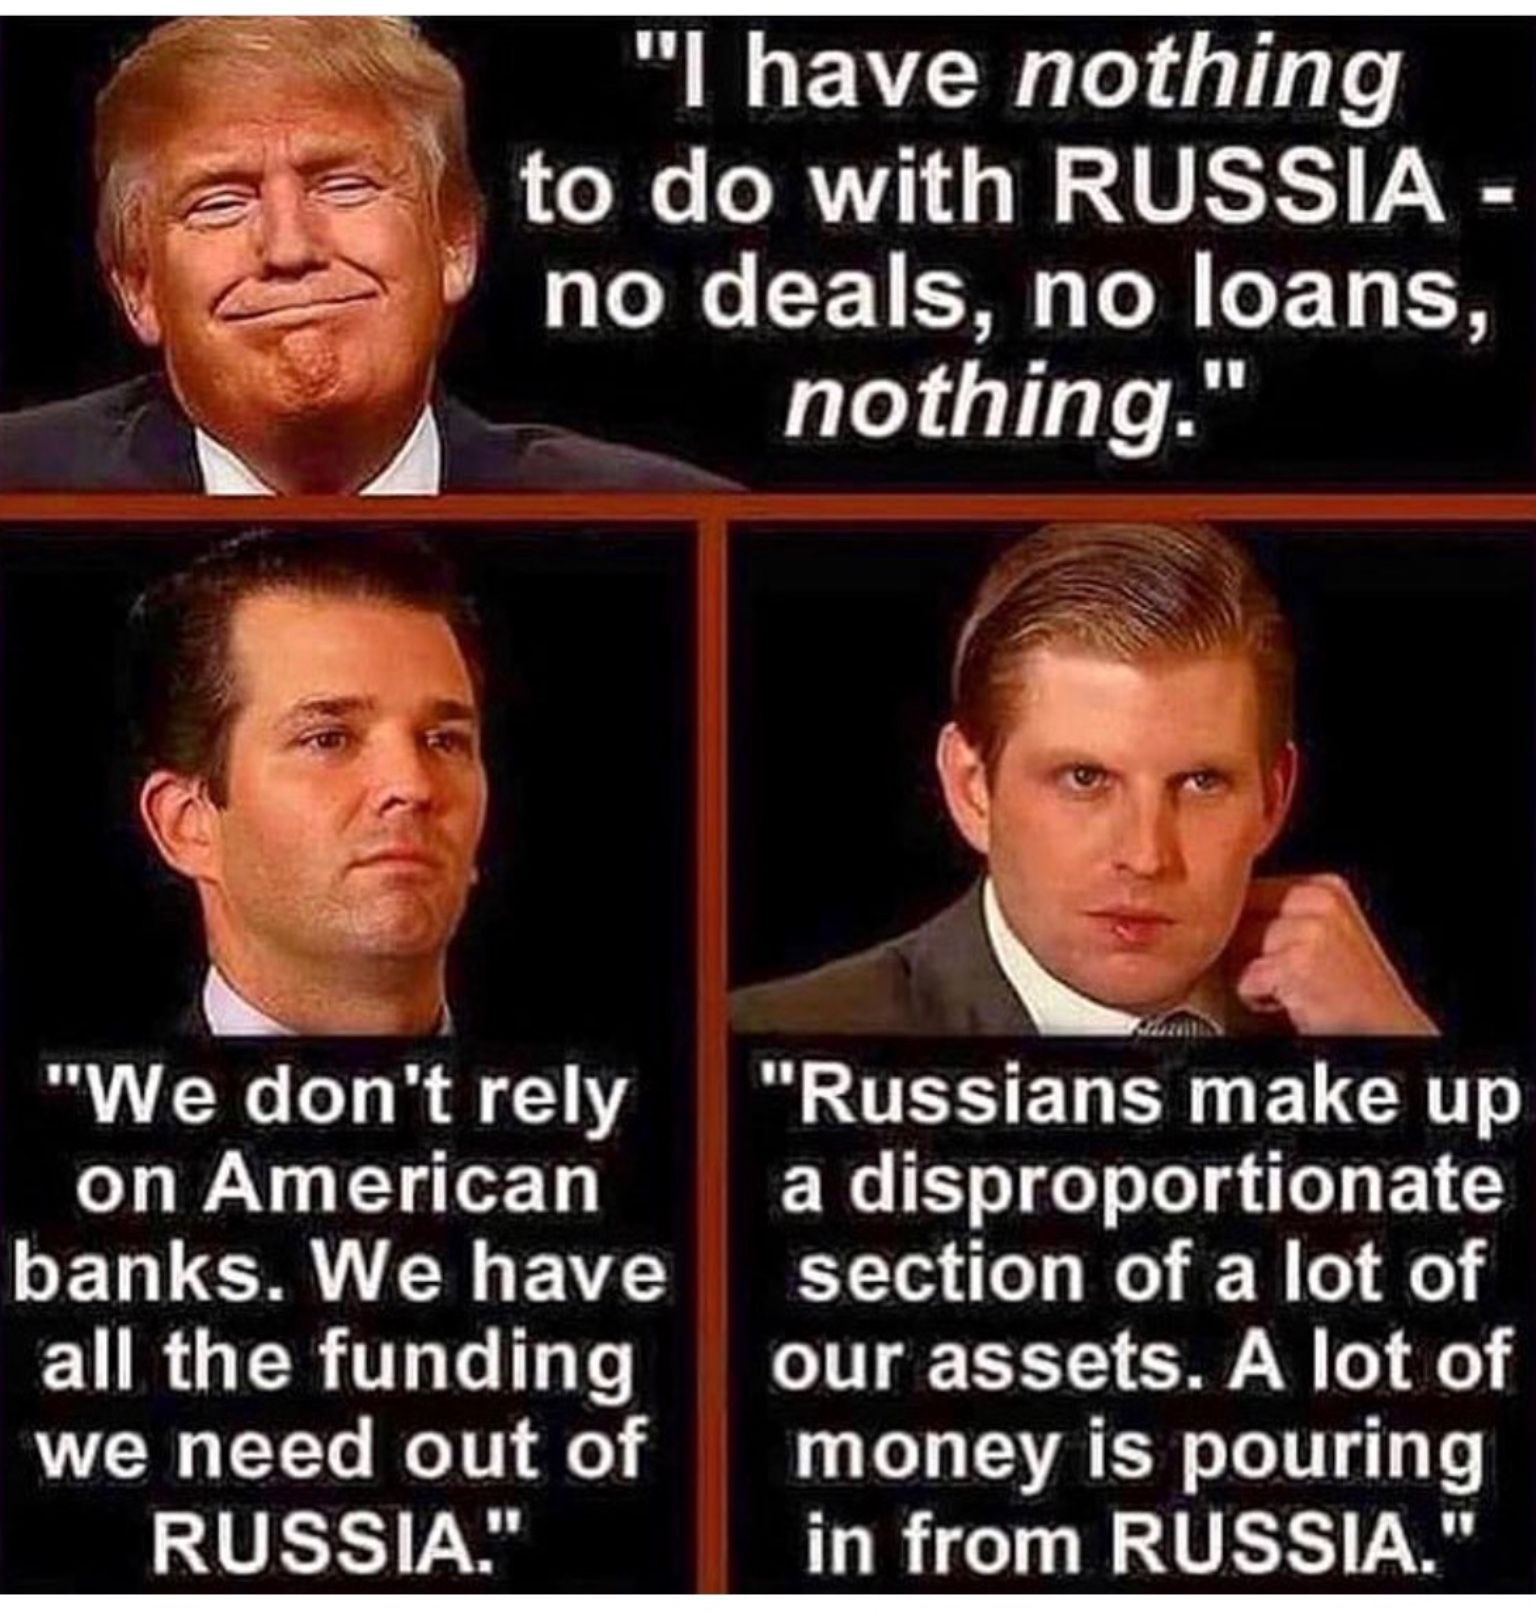 Professional Liars & Crooks